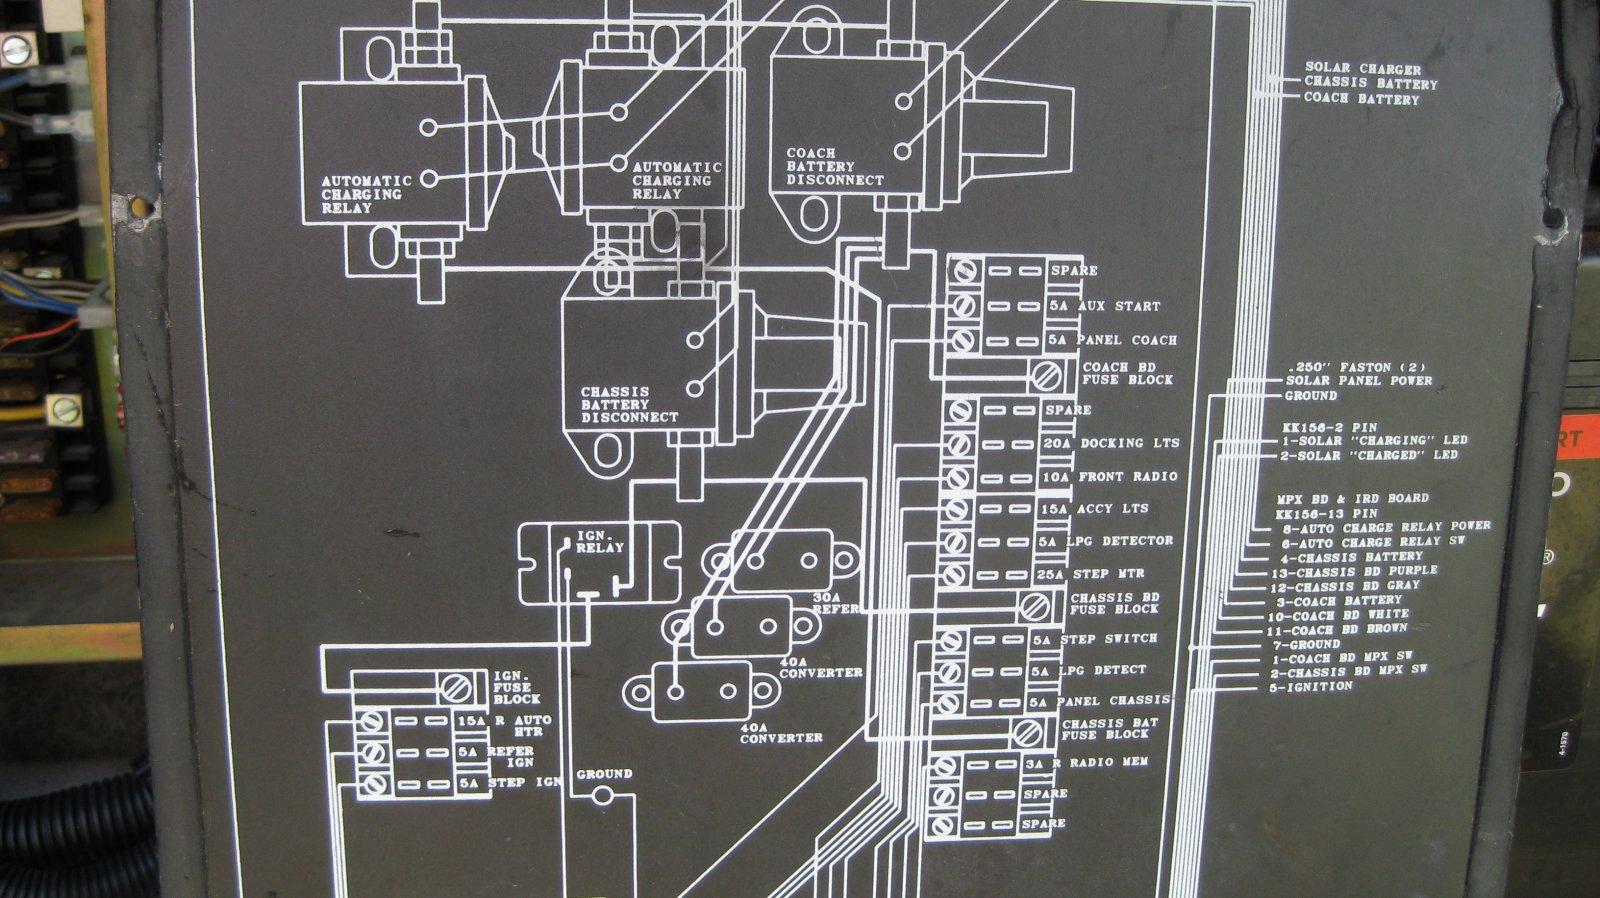 American Coach Intellitec Battery Control center - iRV2 Forums | Battery Control Center Wiring Diagram |  | iRV2 Forums